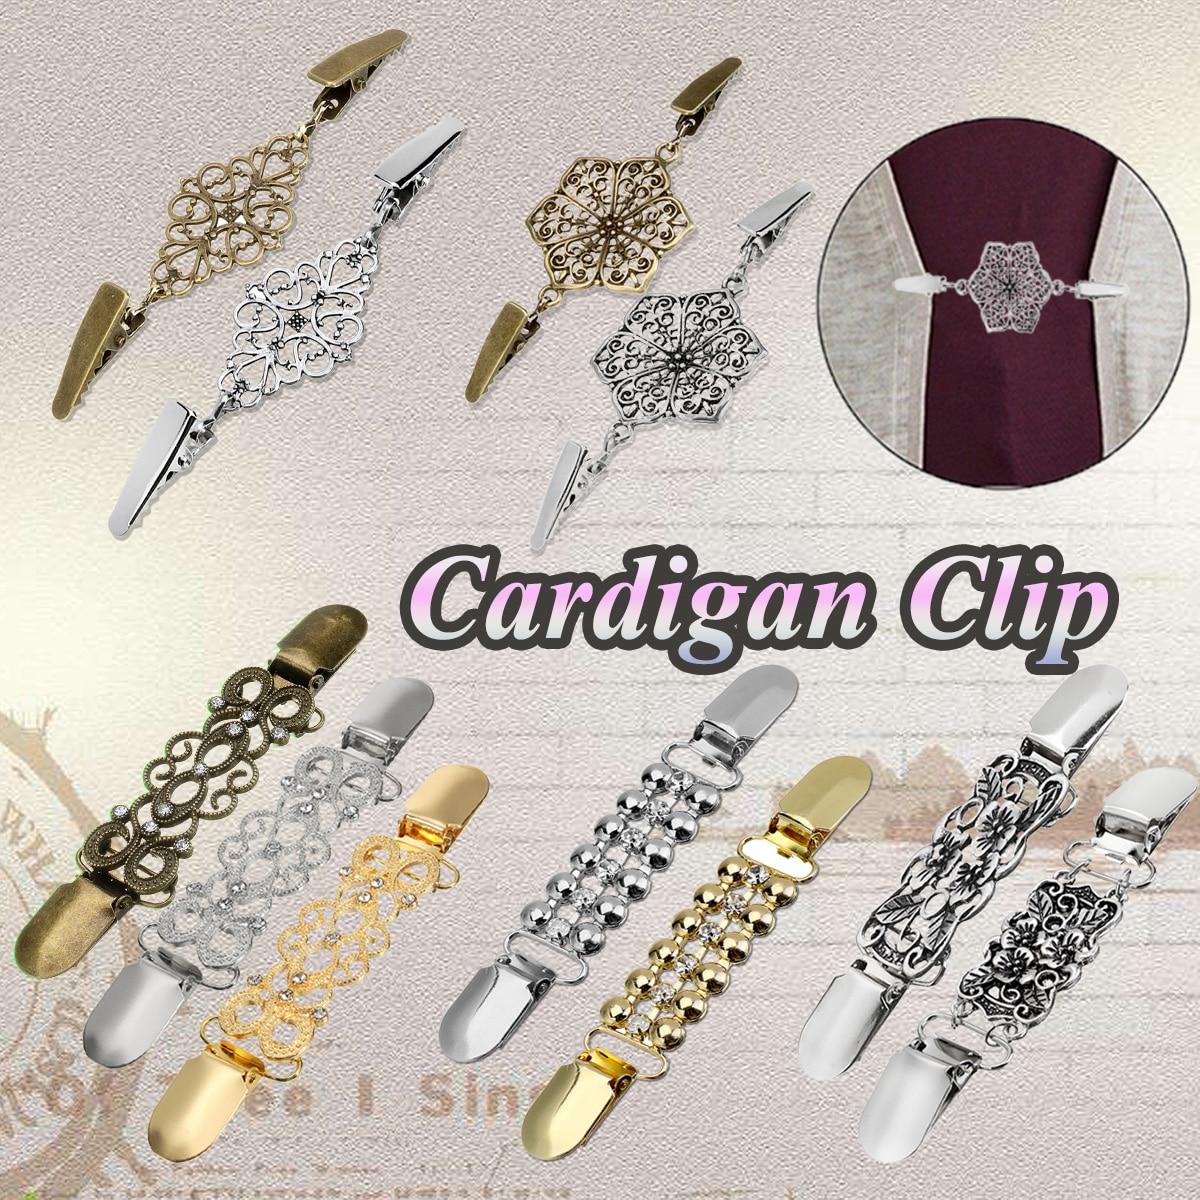 5x Cardigan Clip for Women Sweater Blouse Shawl Shirt Collar Duckbill Clasps